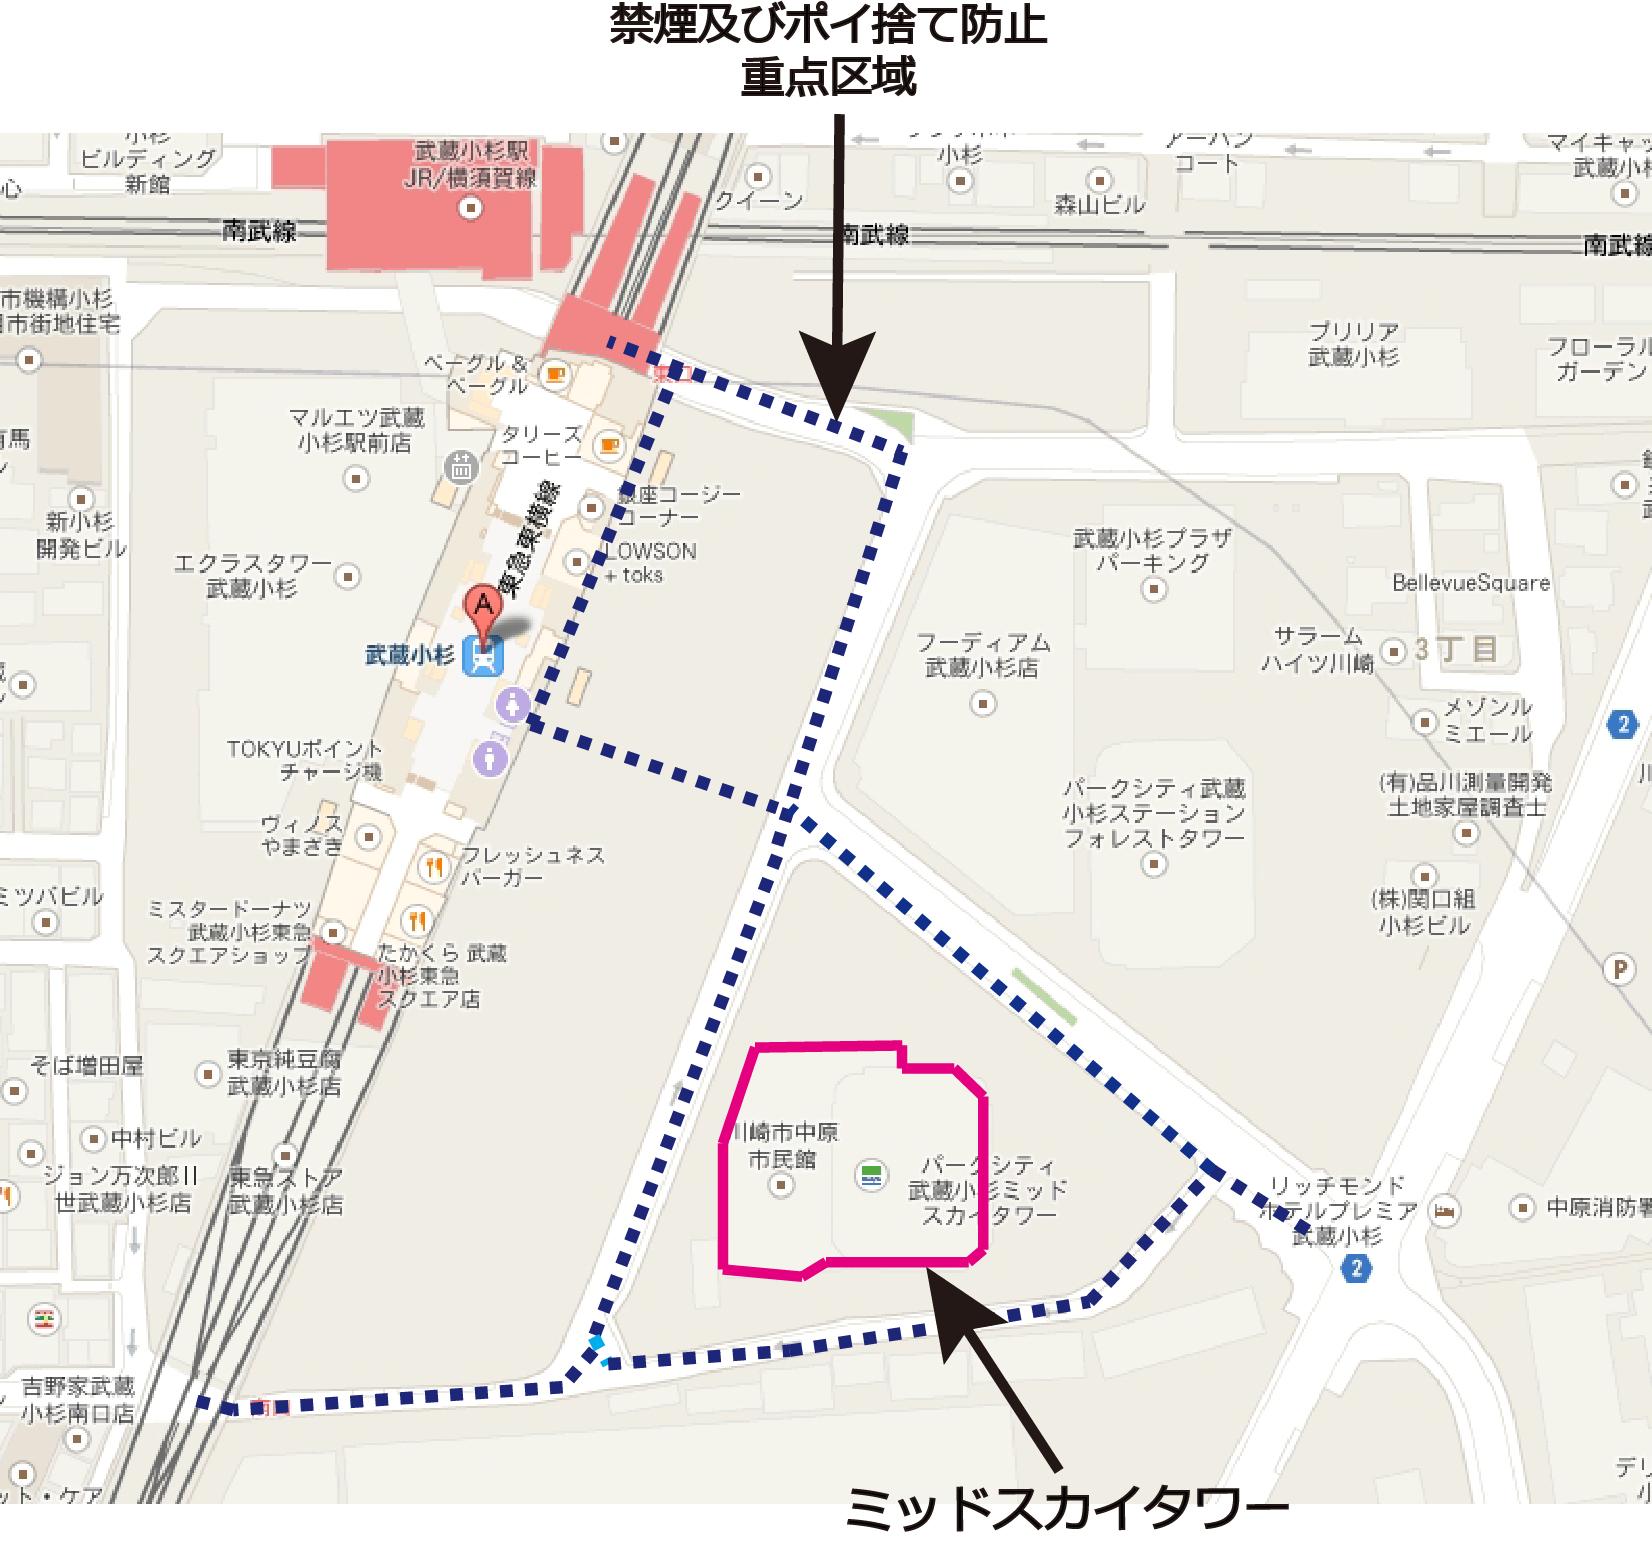 No.7 川崎市路上喫煙防止及びポイ捨て防止の重点区域に指定